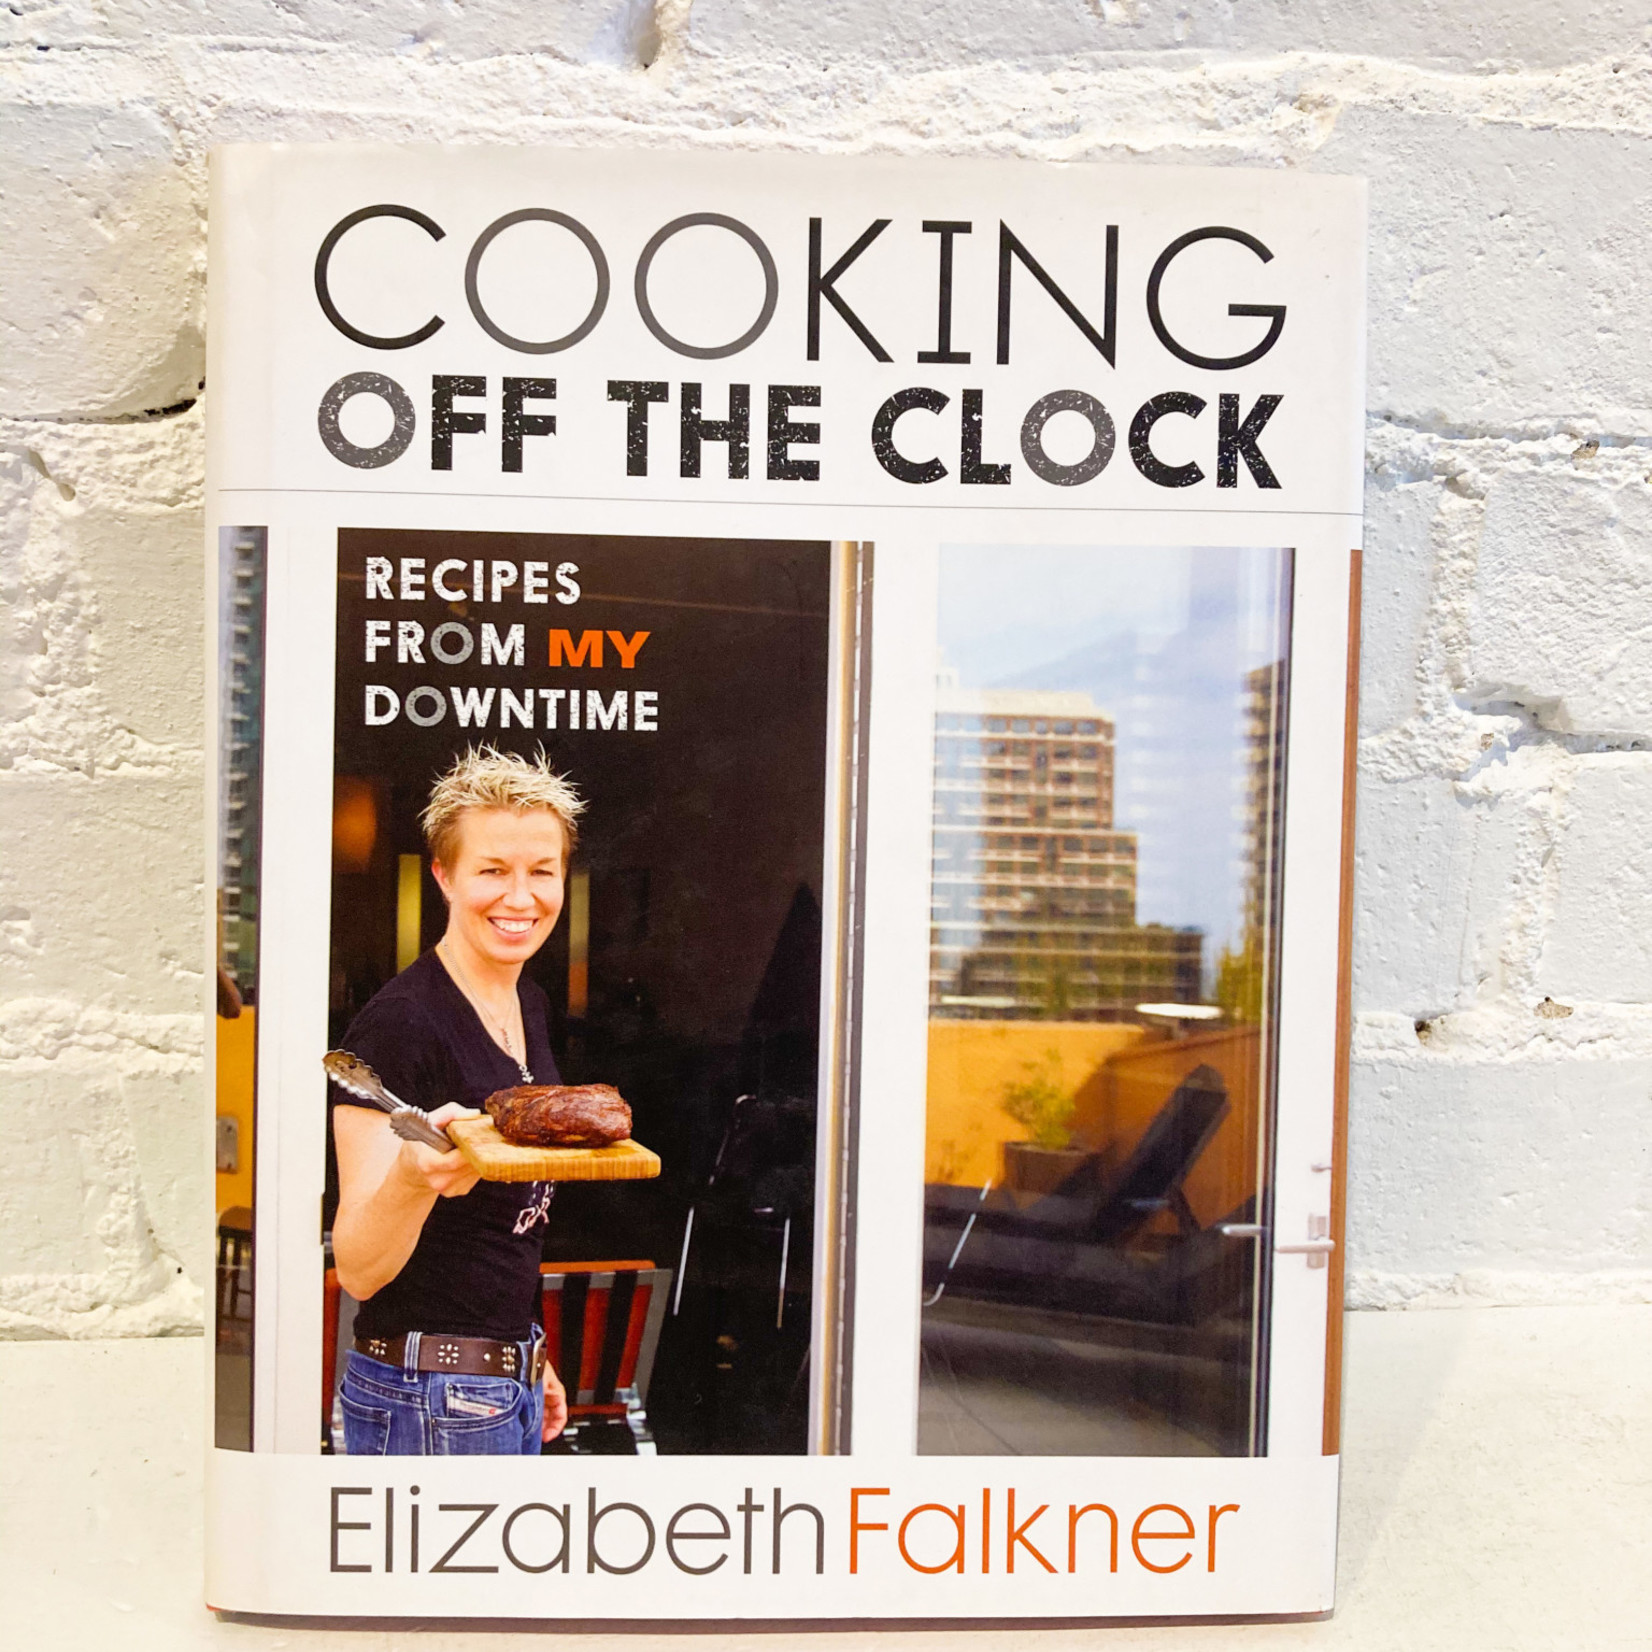 Cooking off the Clock by Elizabeth Falkner